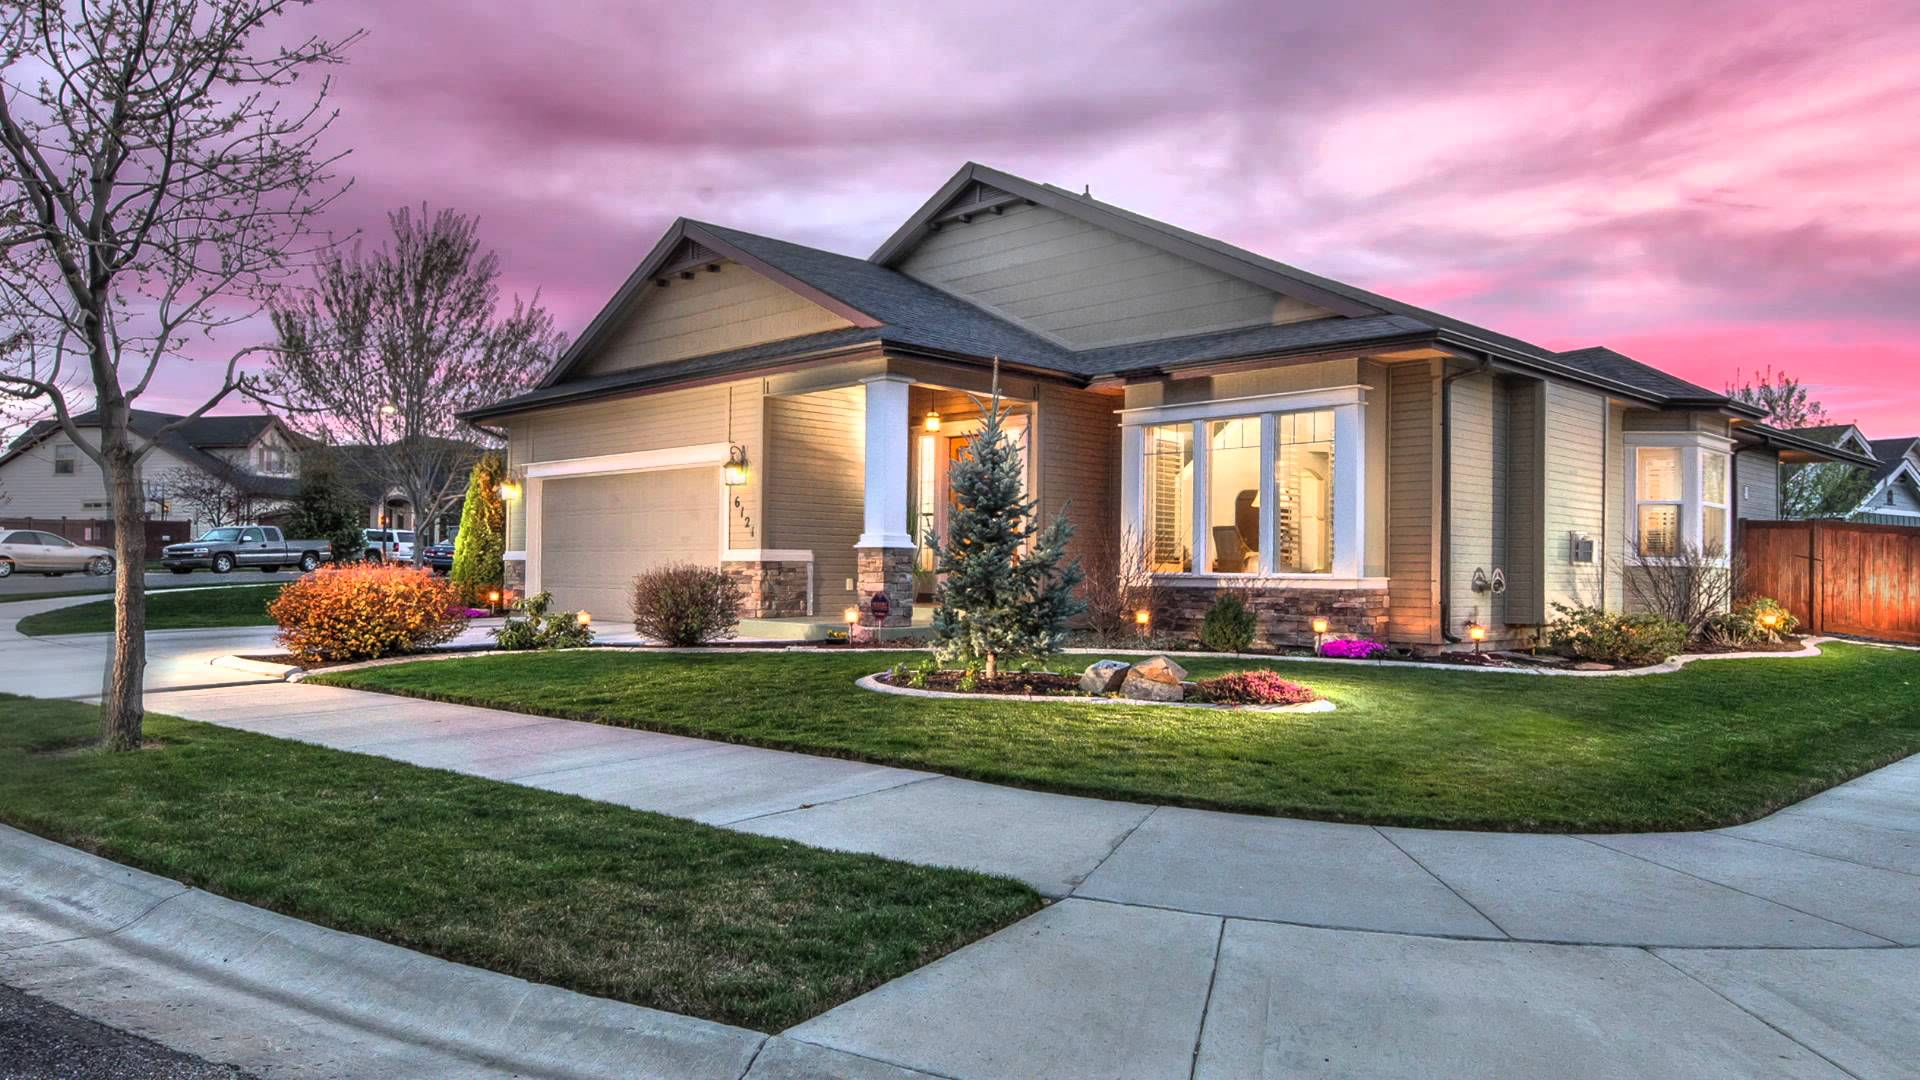 Veritable to pick the proper Real Estate